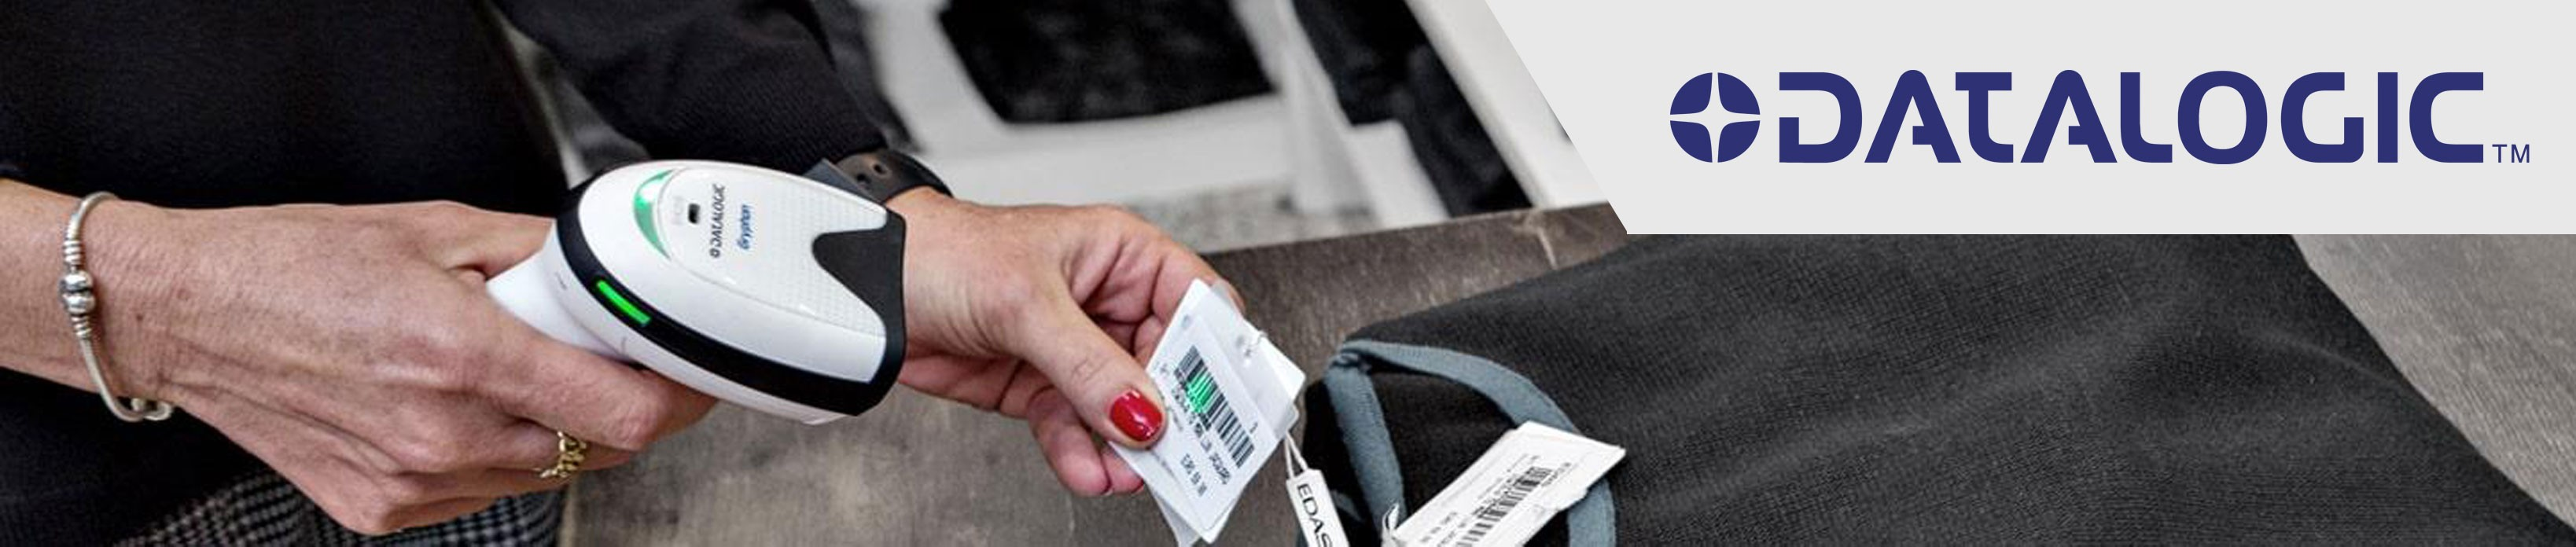 Datalogic Barcode Scanners